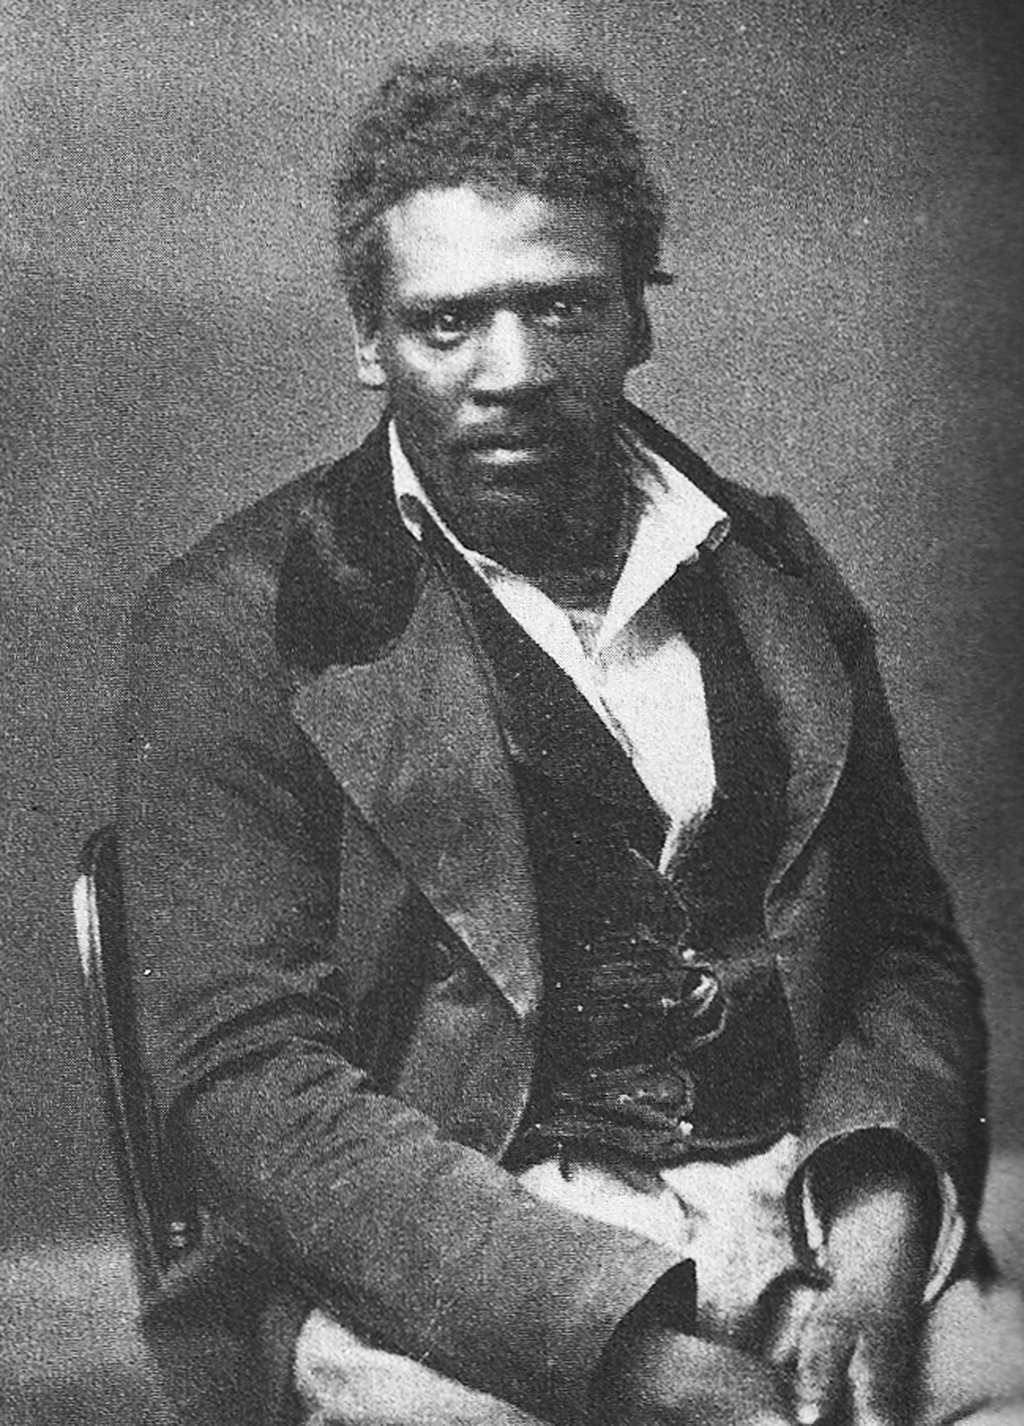 Moses Tate (William B. Seacrest)